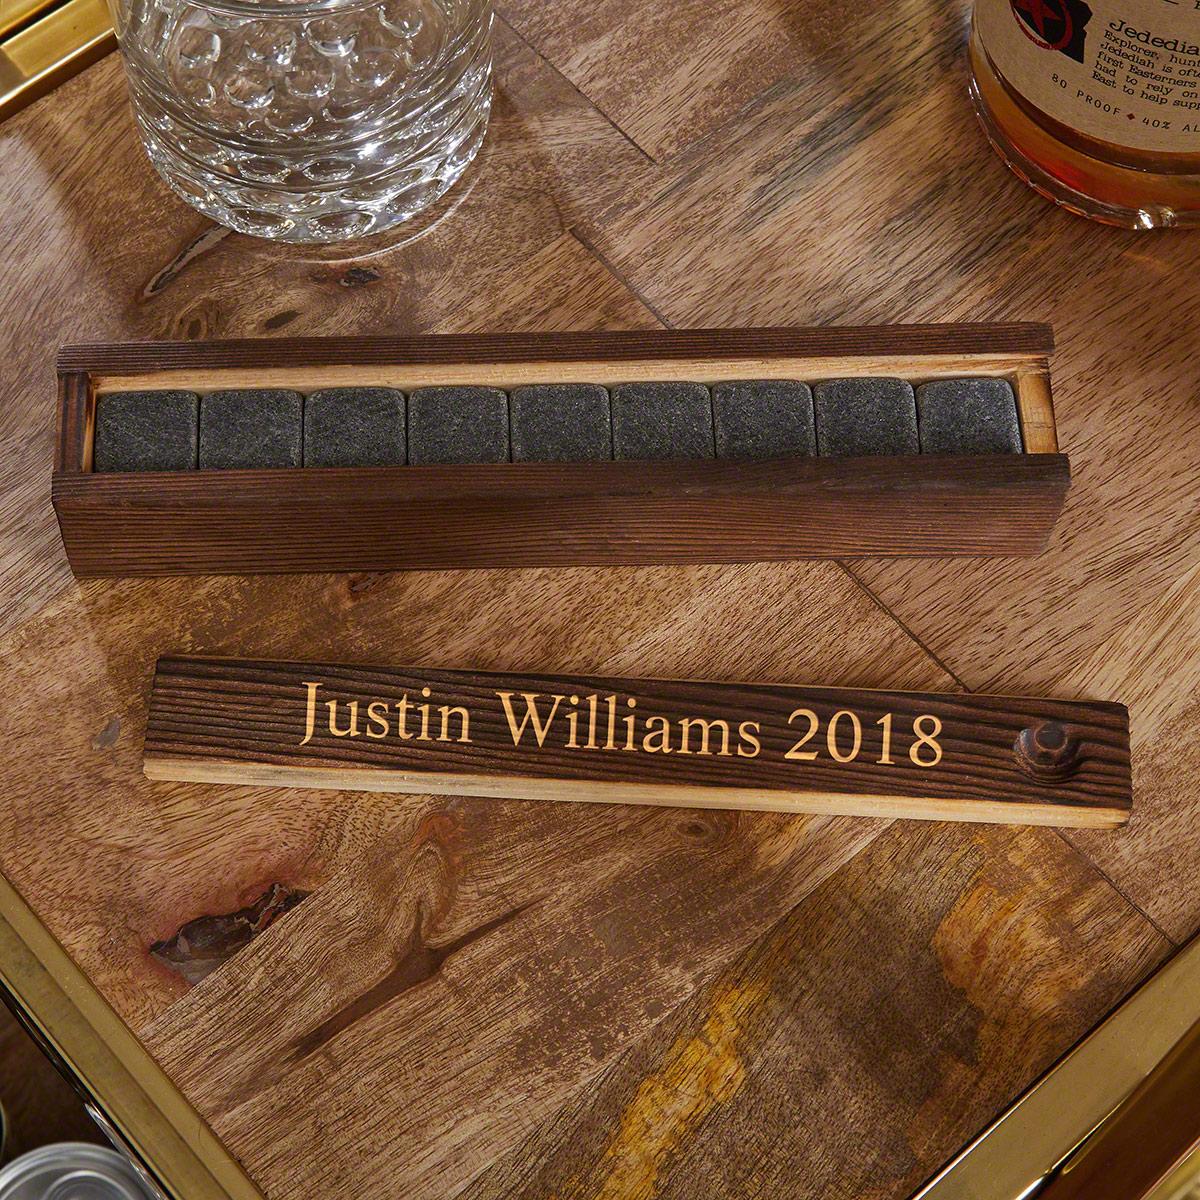 Burton Whiskey Stones & Personalized Gift Box Set